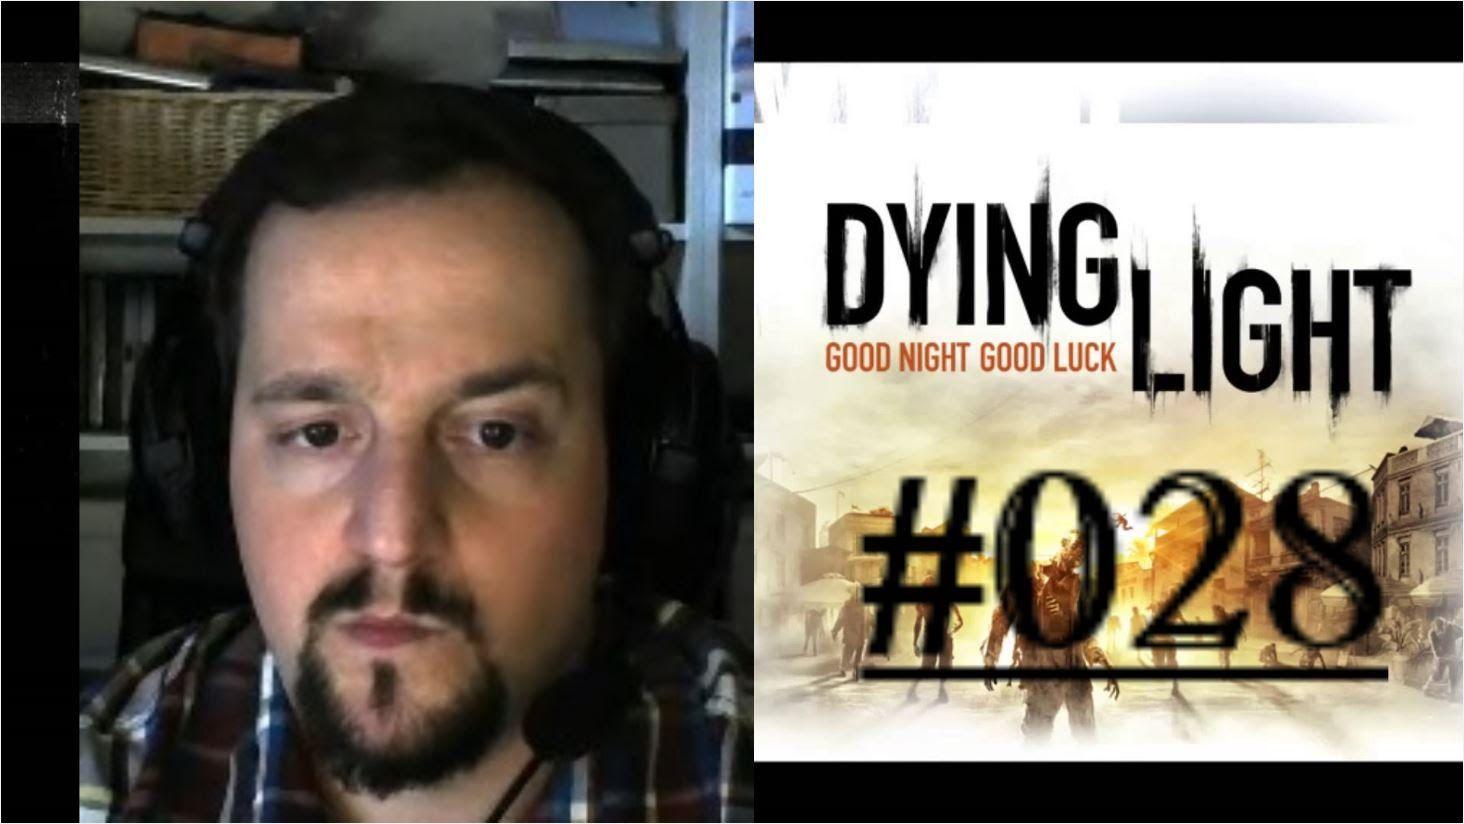 [DE] DYING LIGHT [028] Missionar für Brecken ★ Let's Play Dying Light PC